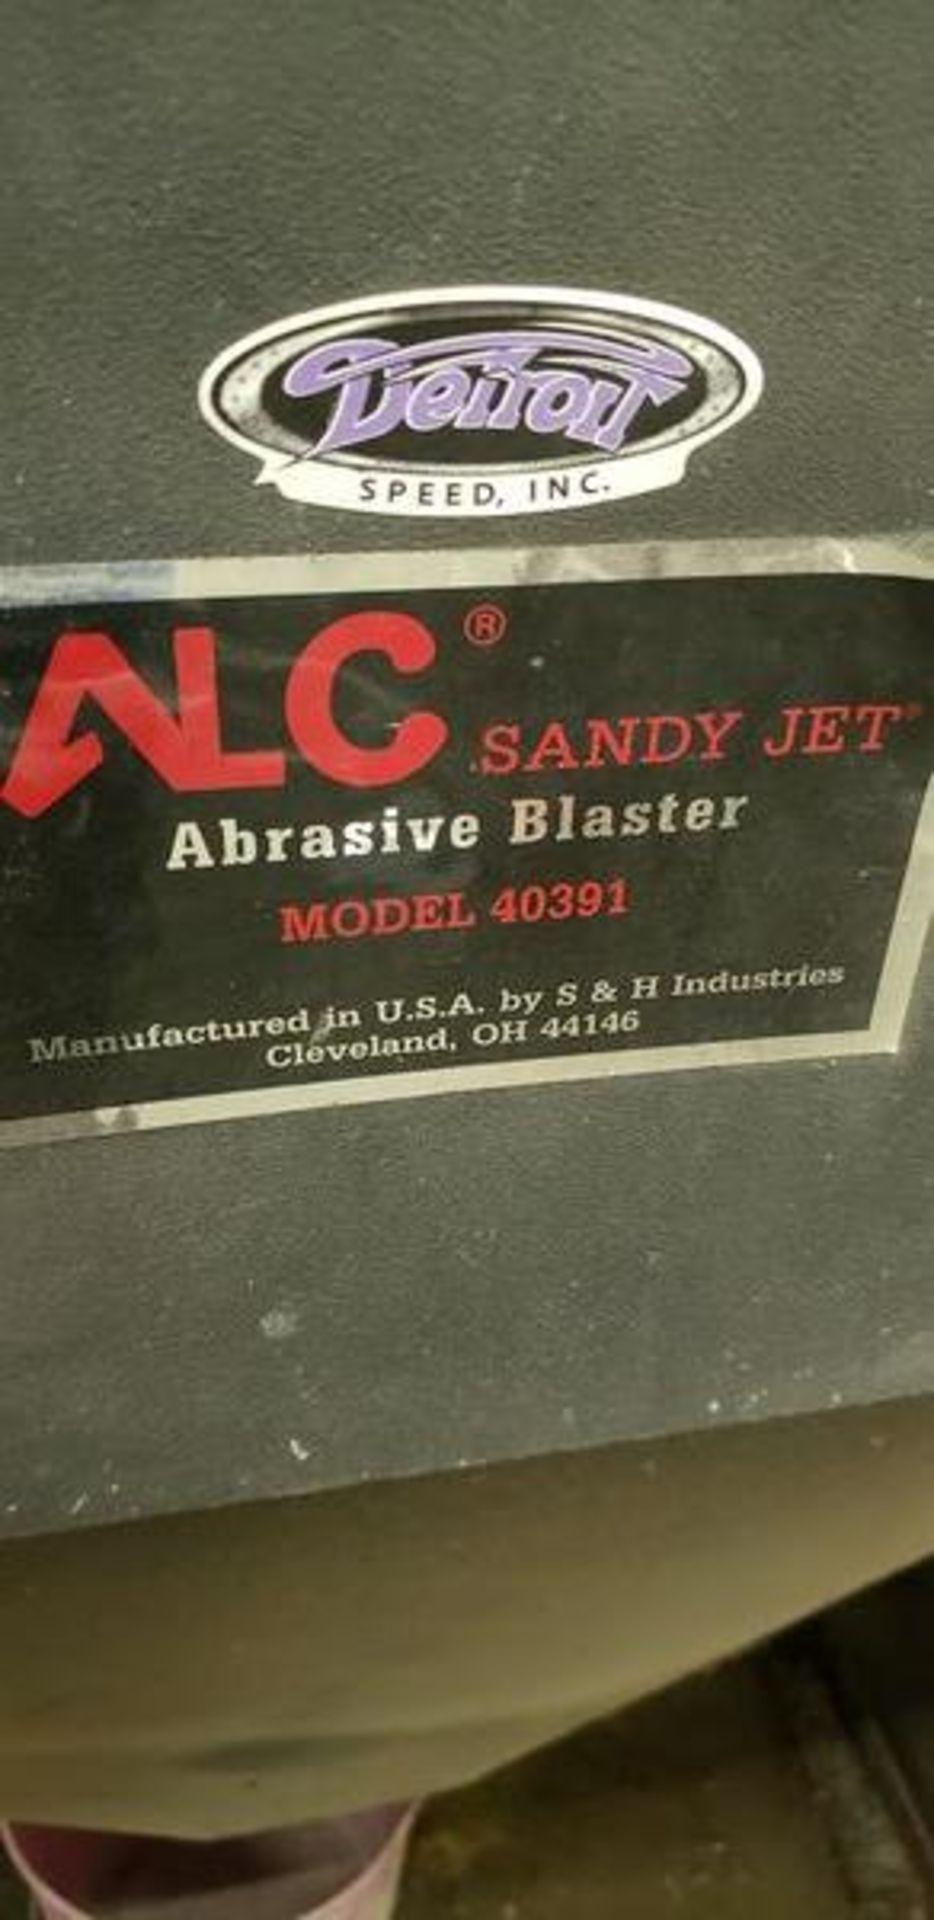 ALC SANDYJET ABRASIVE BLASTER MODEL 40391 - Image 5 of 5